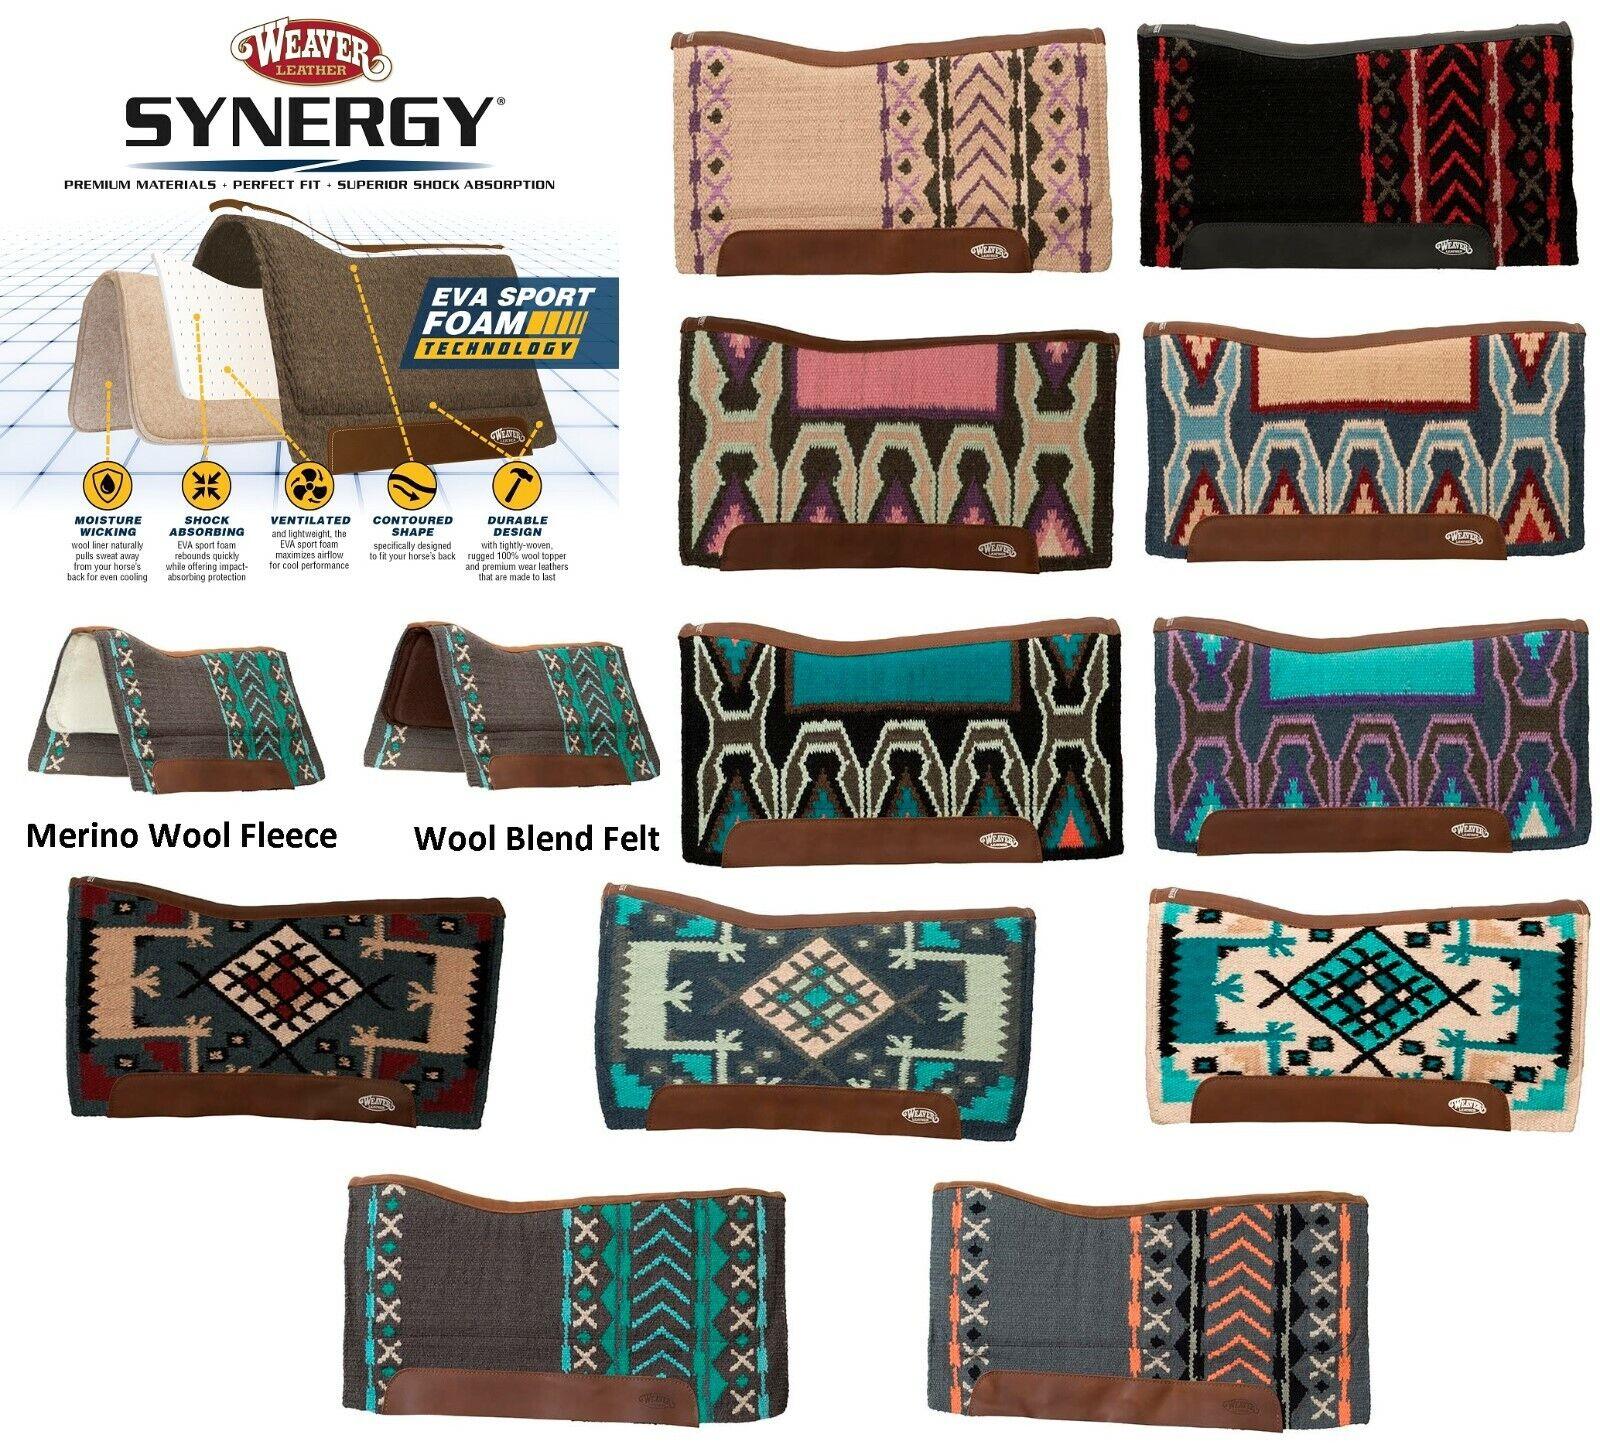 Weaver Leather Synergy Contoured Performance Saddle Pad 33  x38   buy brand